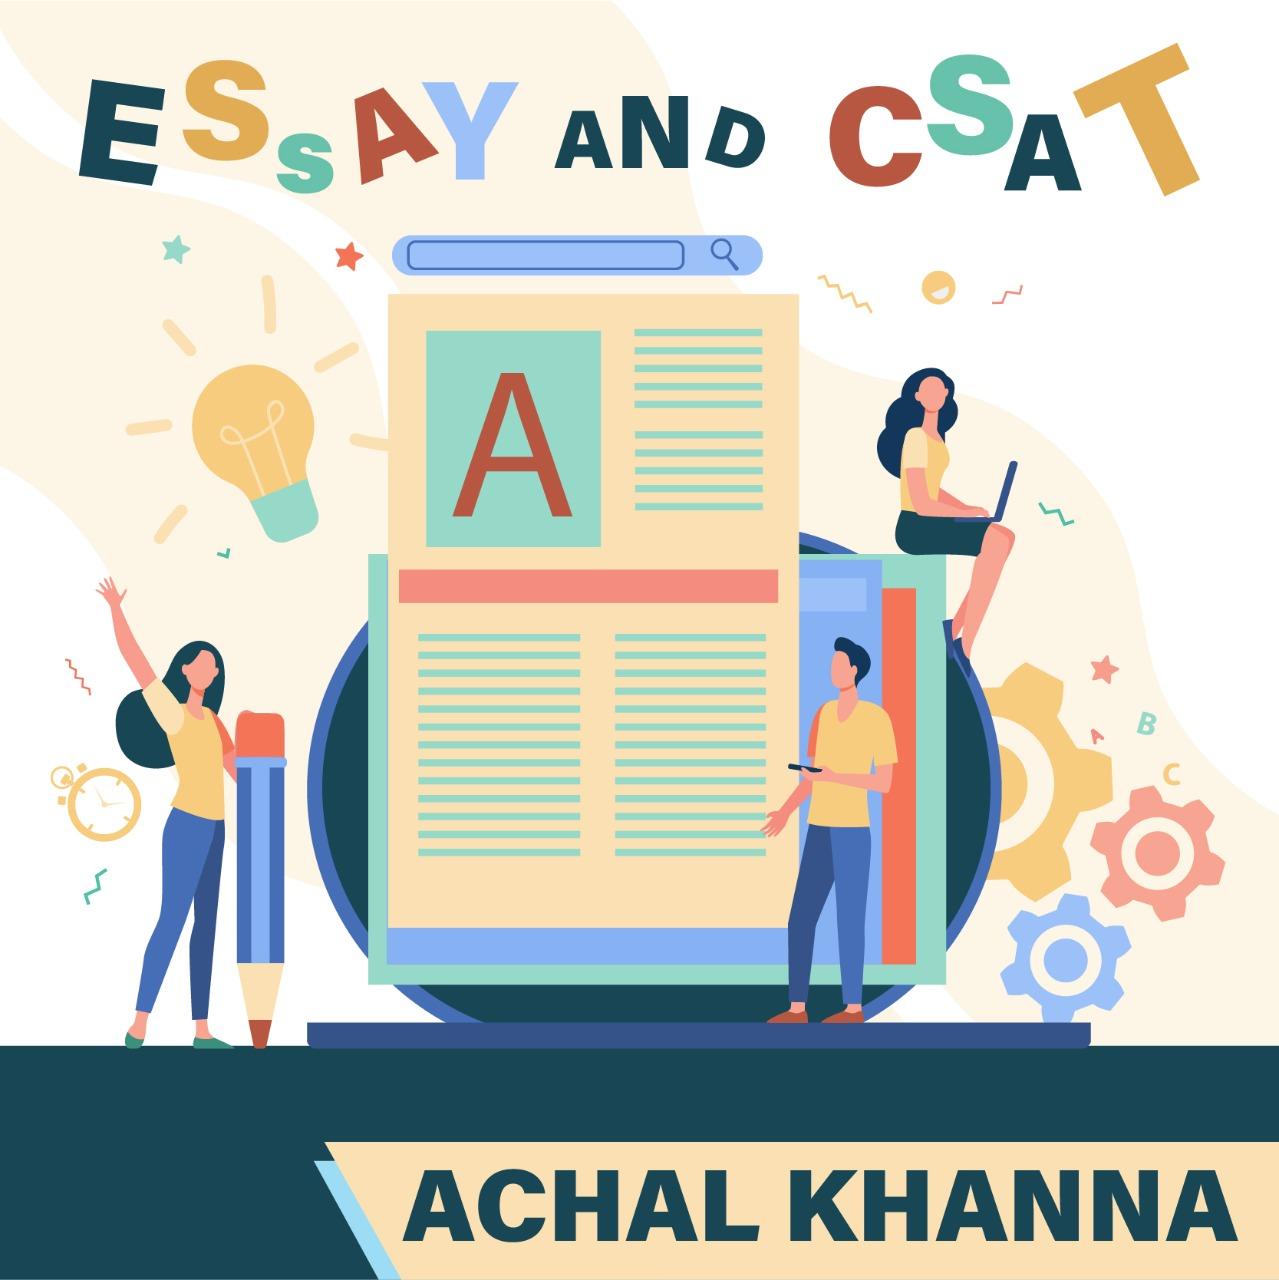 Achal Khanna - ESSAY